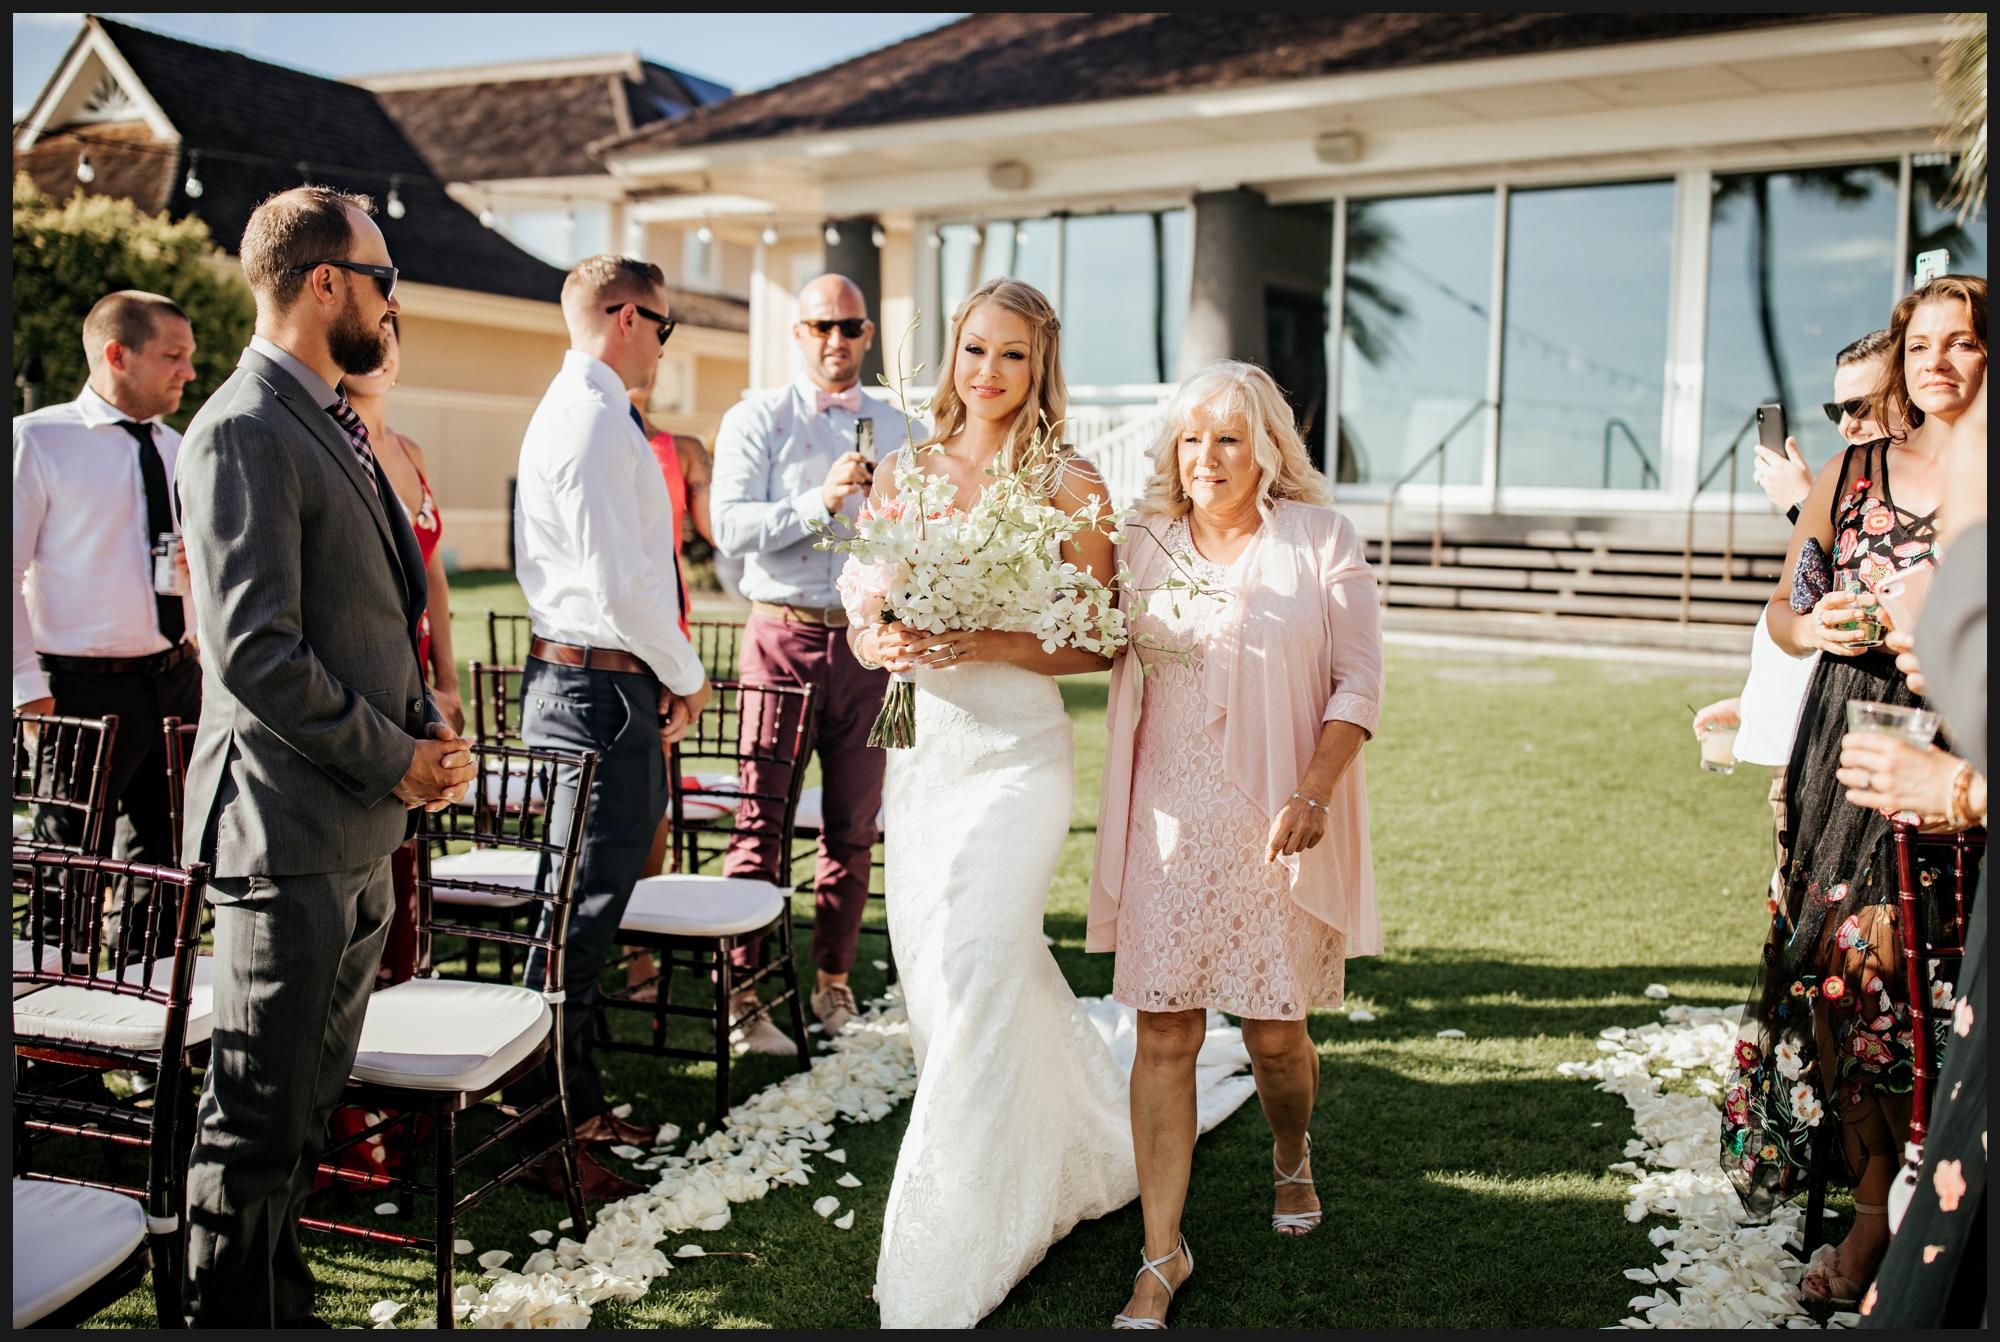 Orlando-Wedding-Photographer-destination-wedding-photographer-florida-wedding-photographer-hawaii-wedding-photographer_0054.jpg